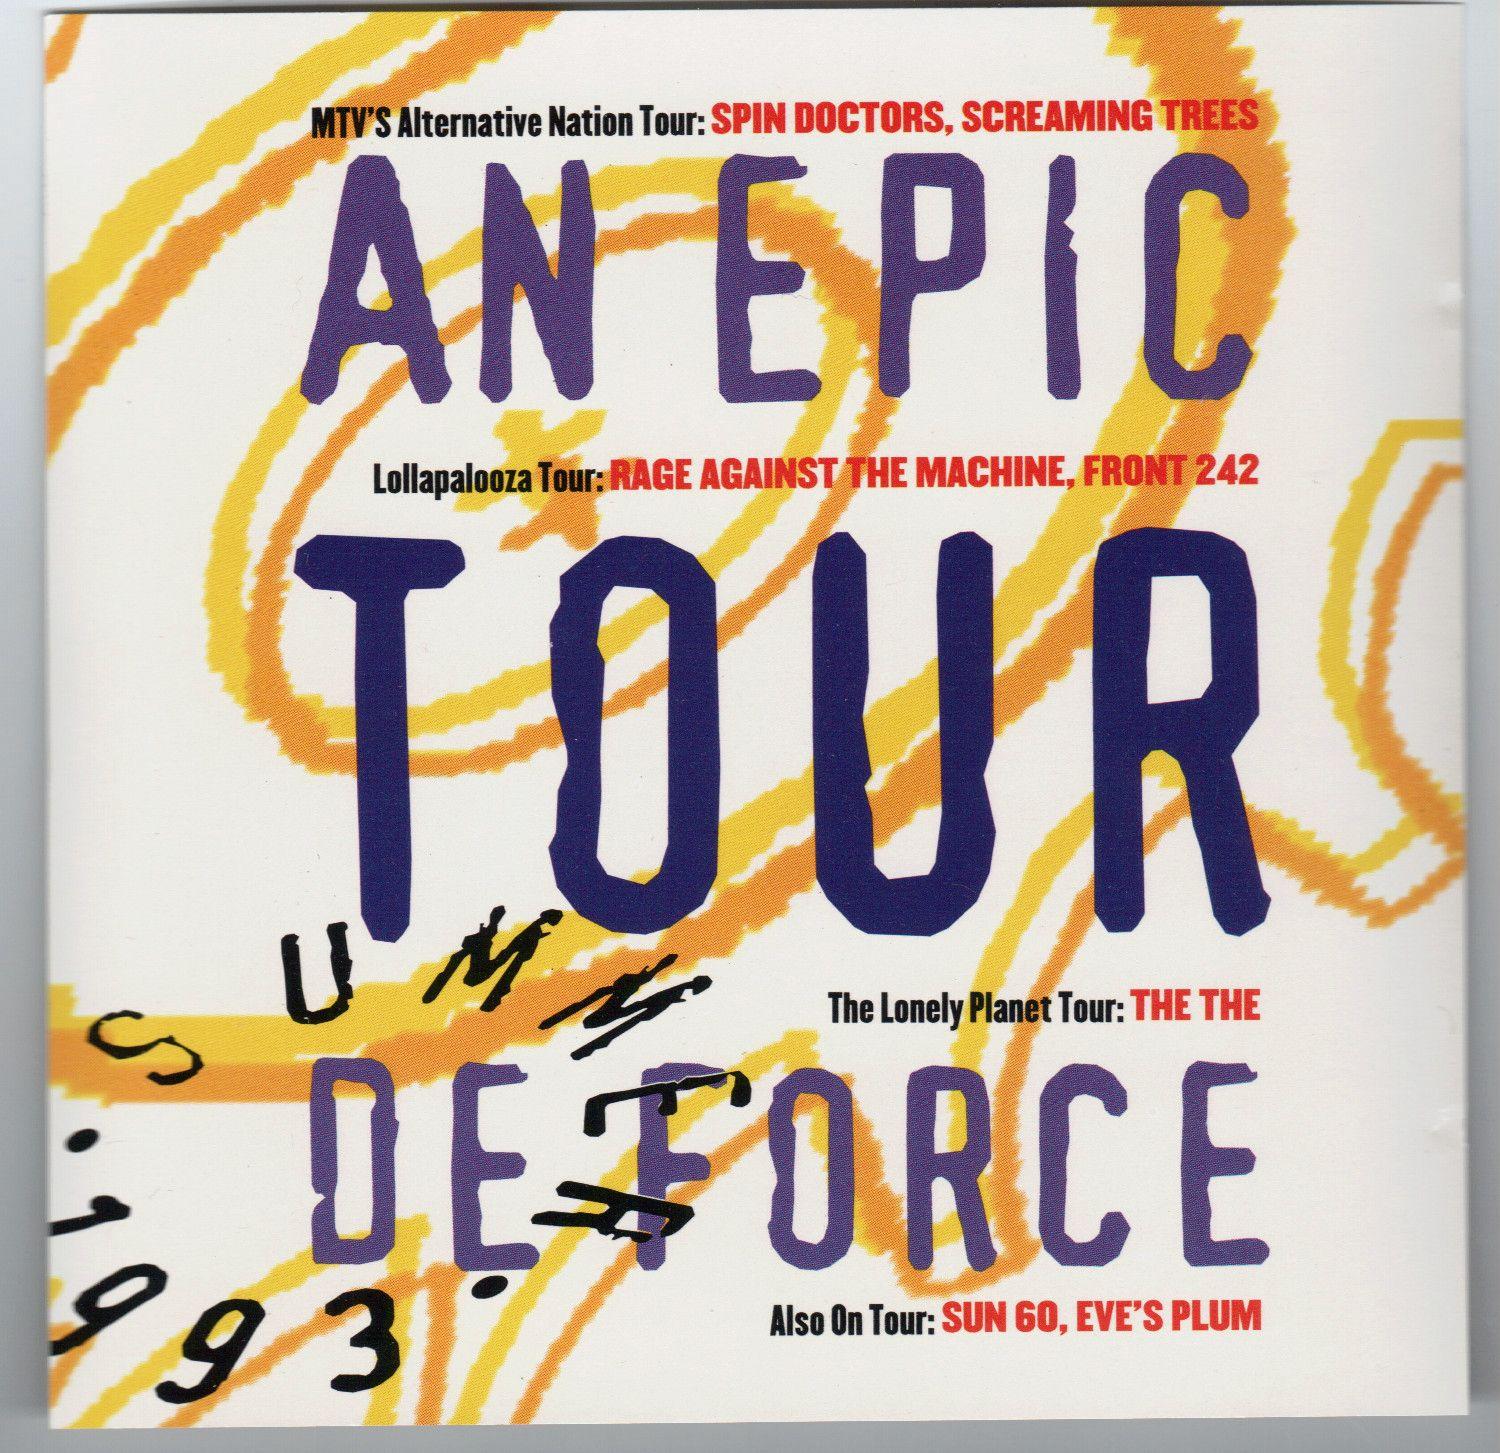 http://2.bp.blogspot.com/_QkZOSJqlx7Y/TQhKxs-suqI/AAAAAAAAA1A/C3qhkNh4kGc/s1600/An+Epic+Tour+De+Force.jpg